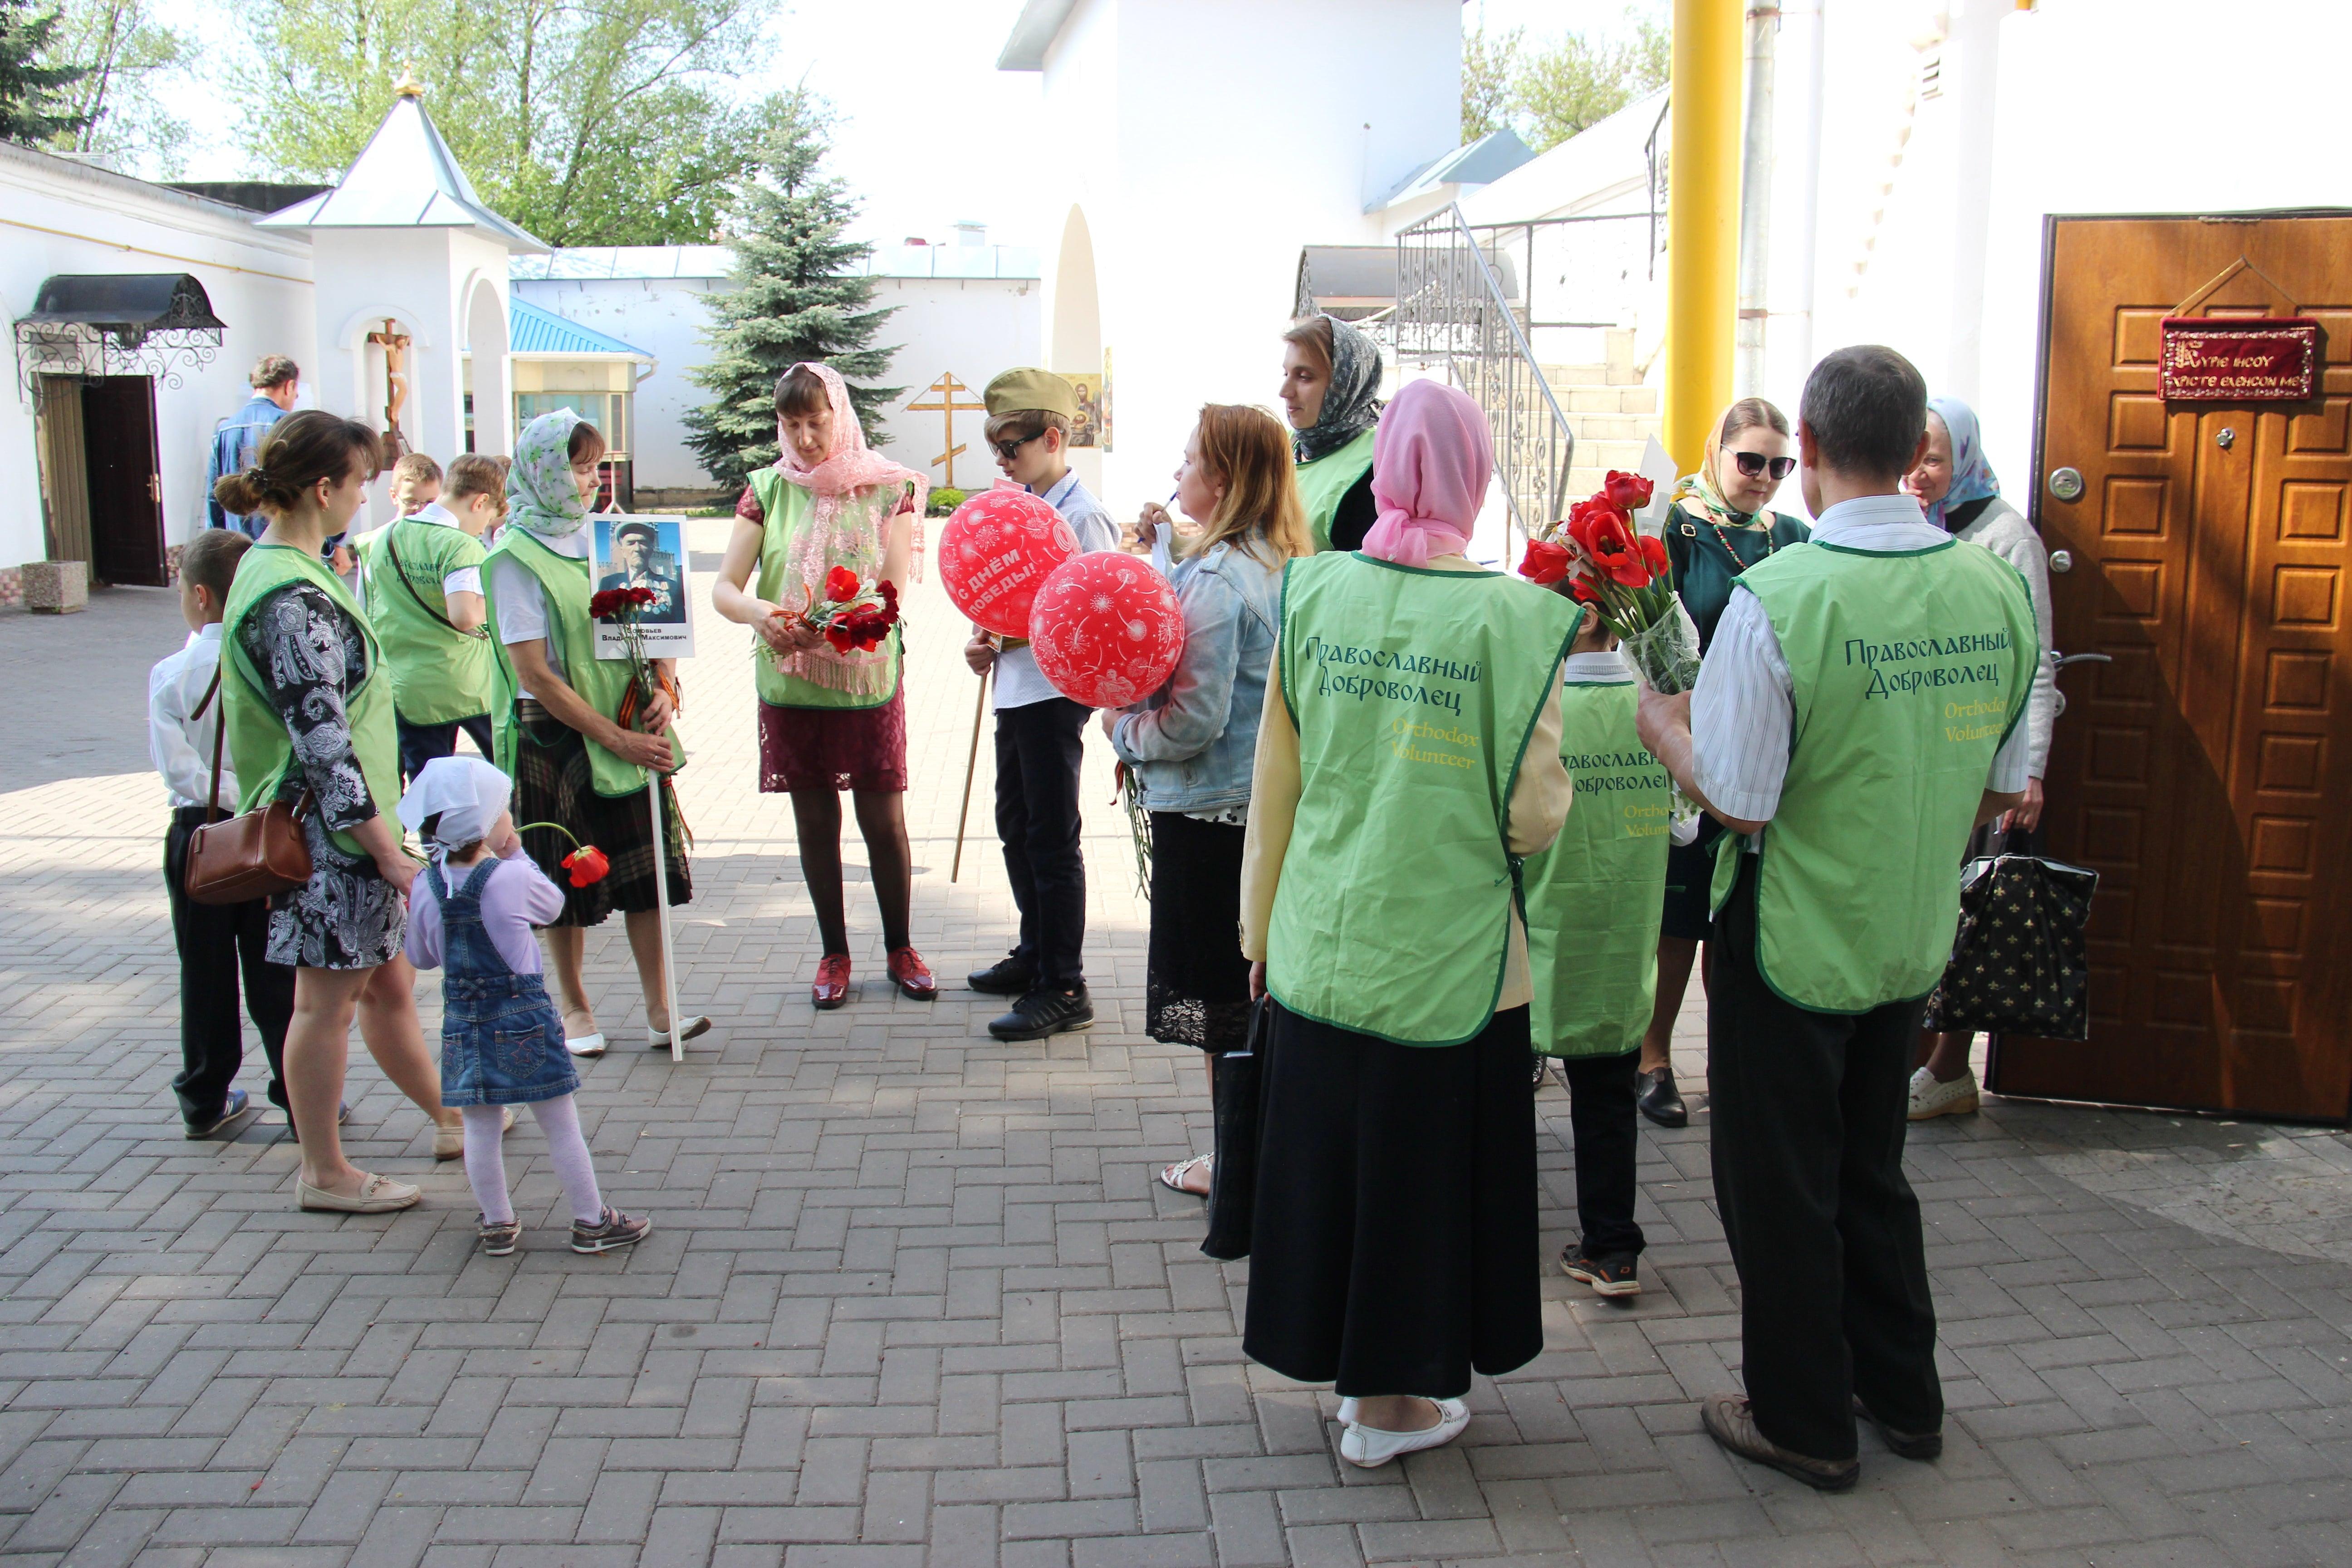 http://monuspen.ru/photoreports/ba2010941251efe9afabca220cb49d68.JPG